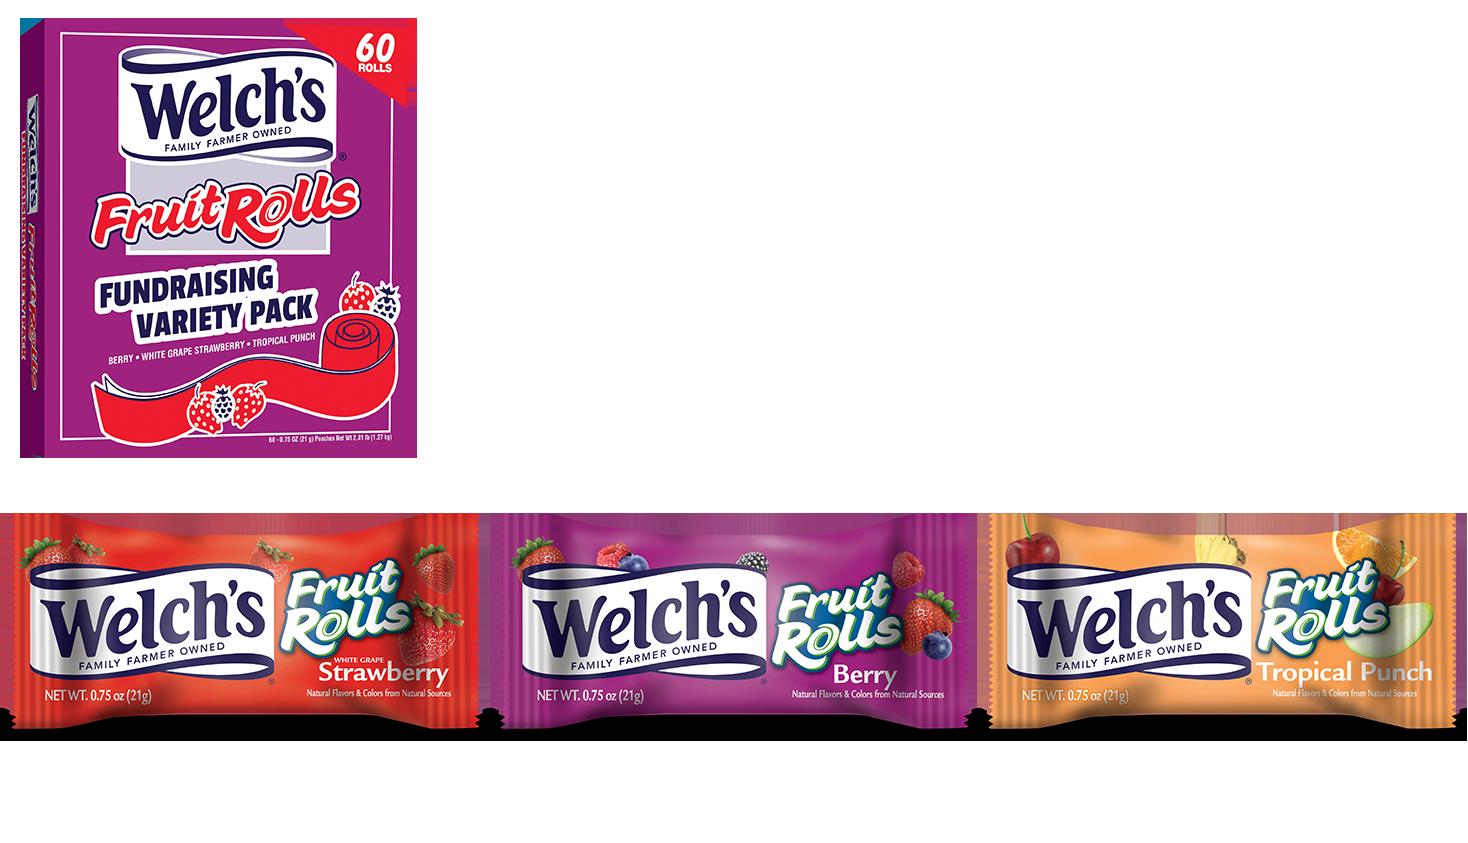 welch's fruitrolls packs